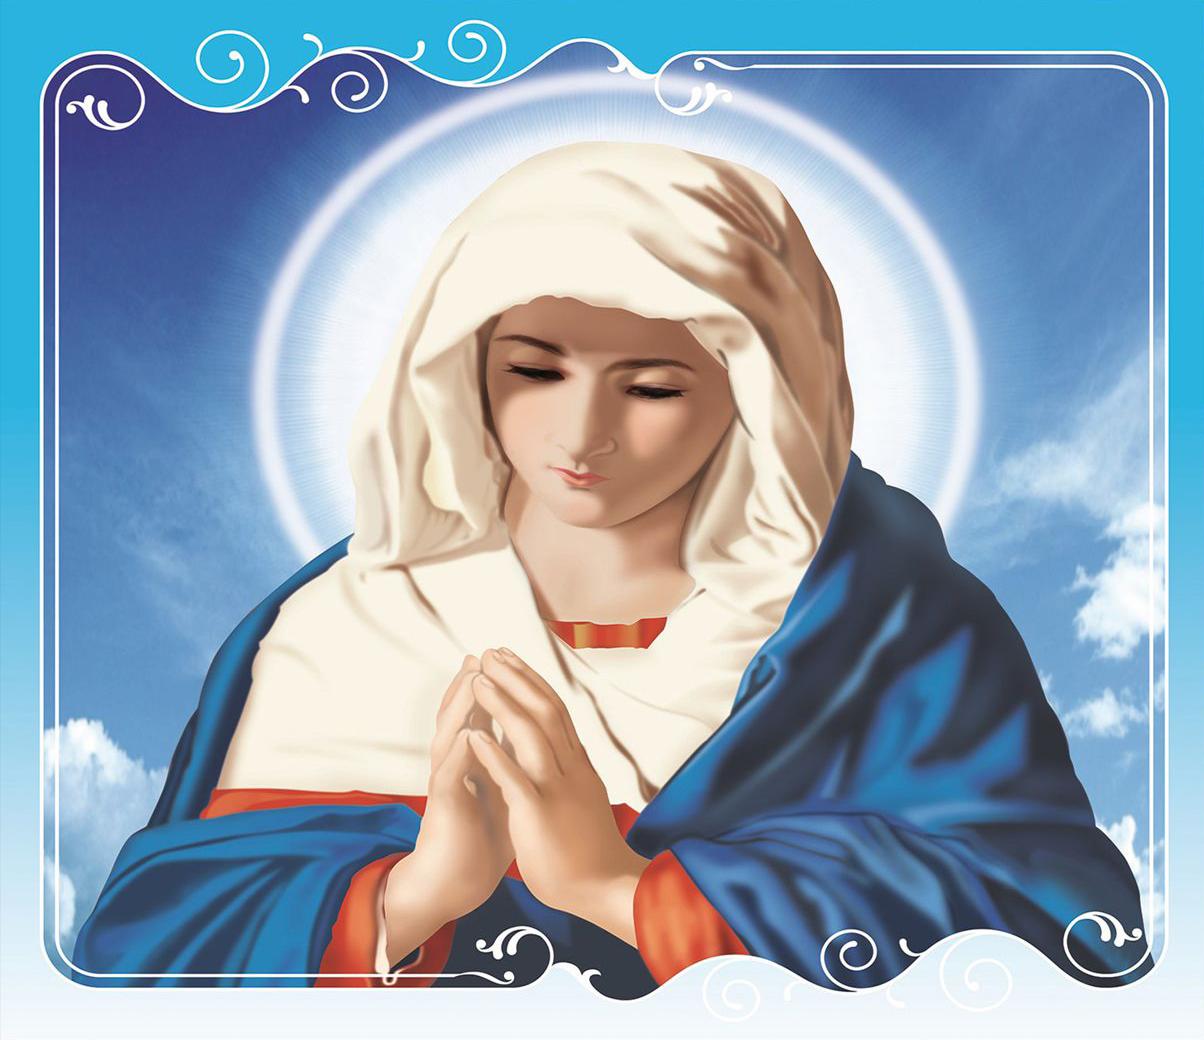 hình nền mẹ Maria